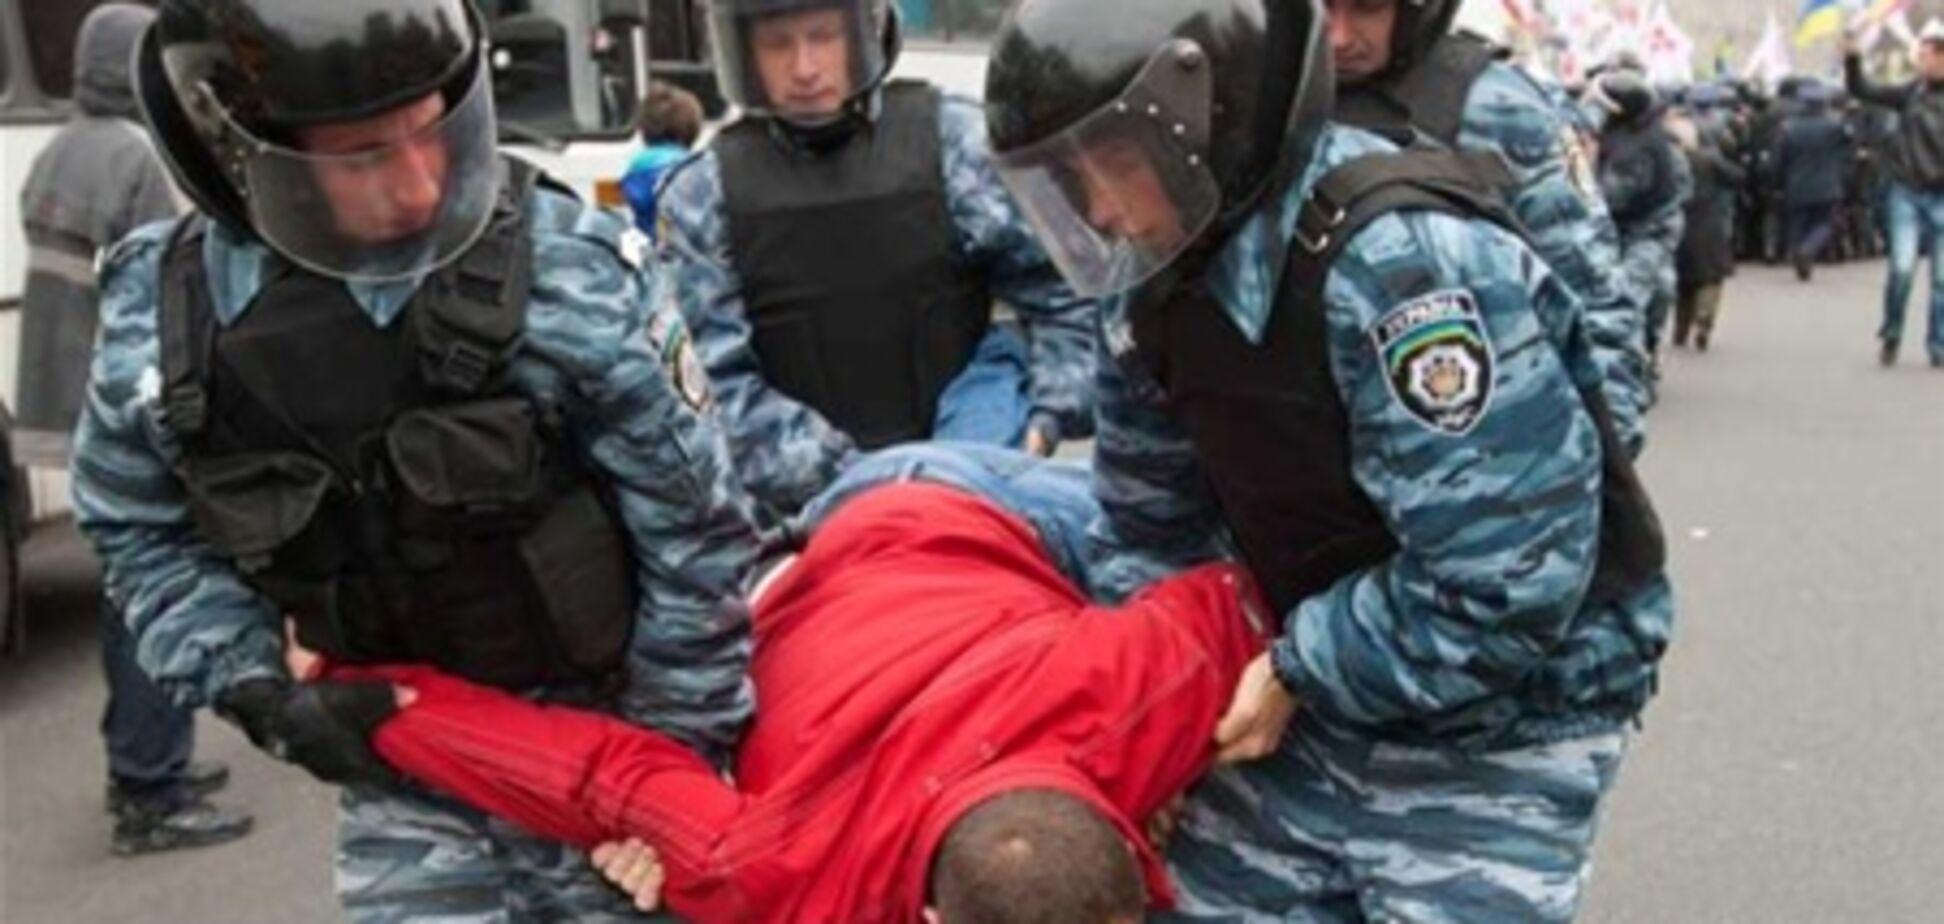 В Донецке во время митинга 'Беркут' избил инвалида